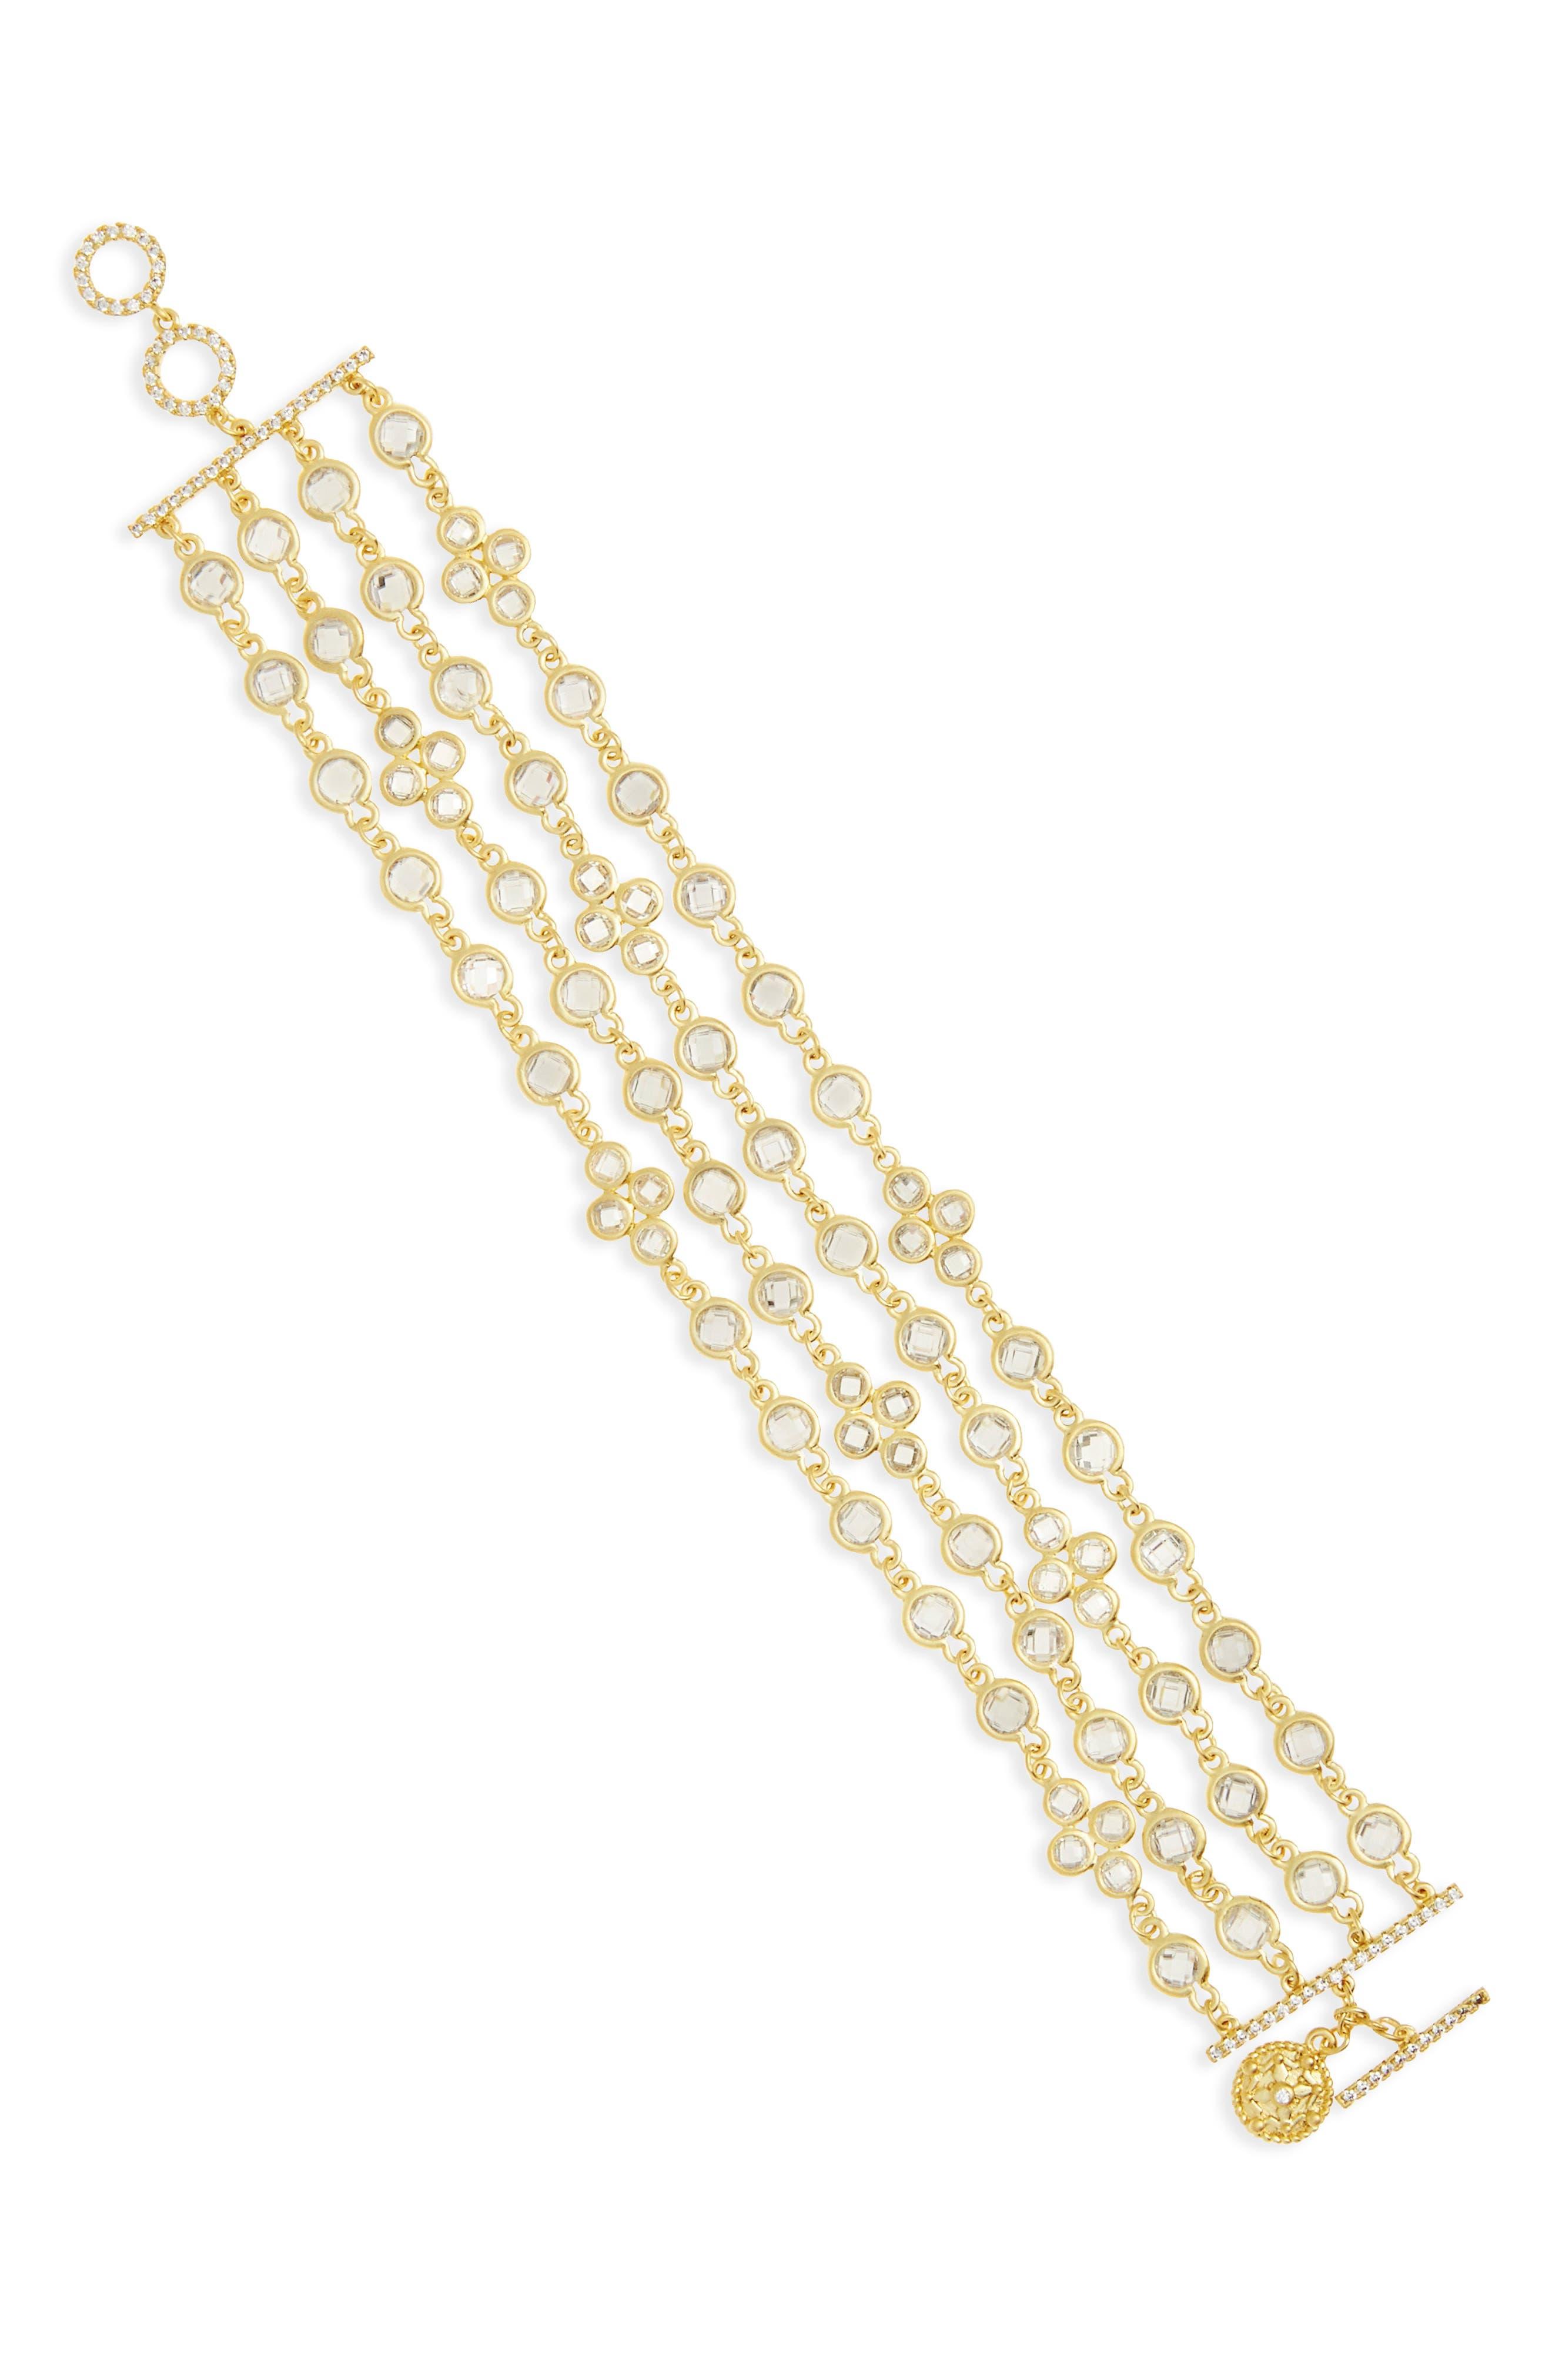 FREIDA ROTHMAN Audrey Radiance Four-Chain Bracelet